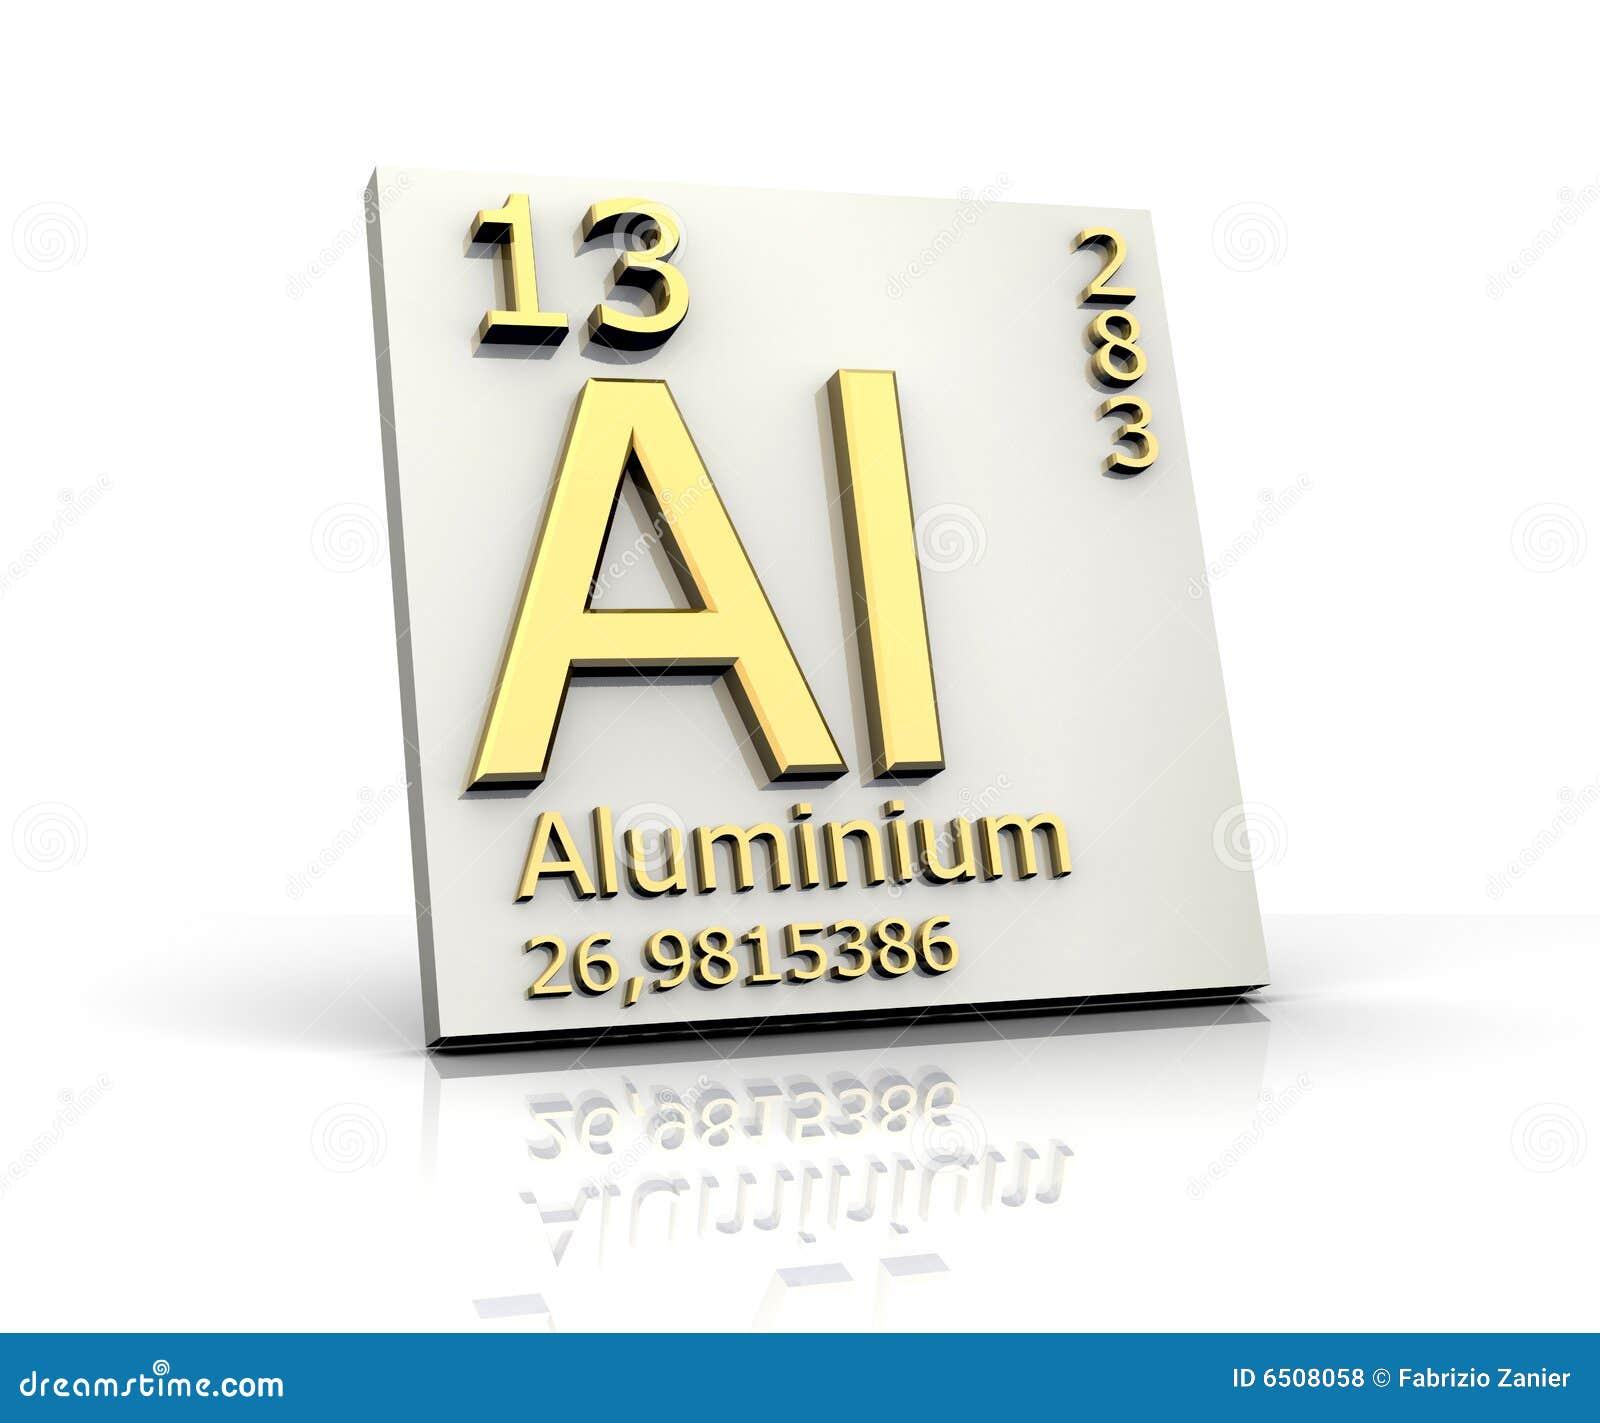 Aluminum form periodic table of elements stock illustration download aluminum form periodic table of elements stock illustration illustration of formula einstein urtaz Choice Image